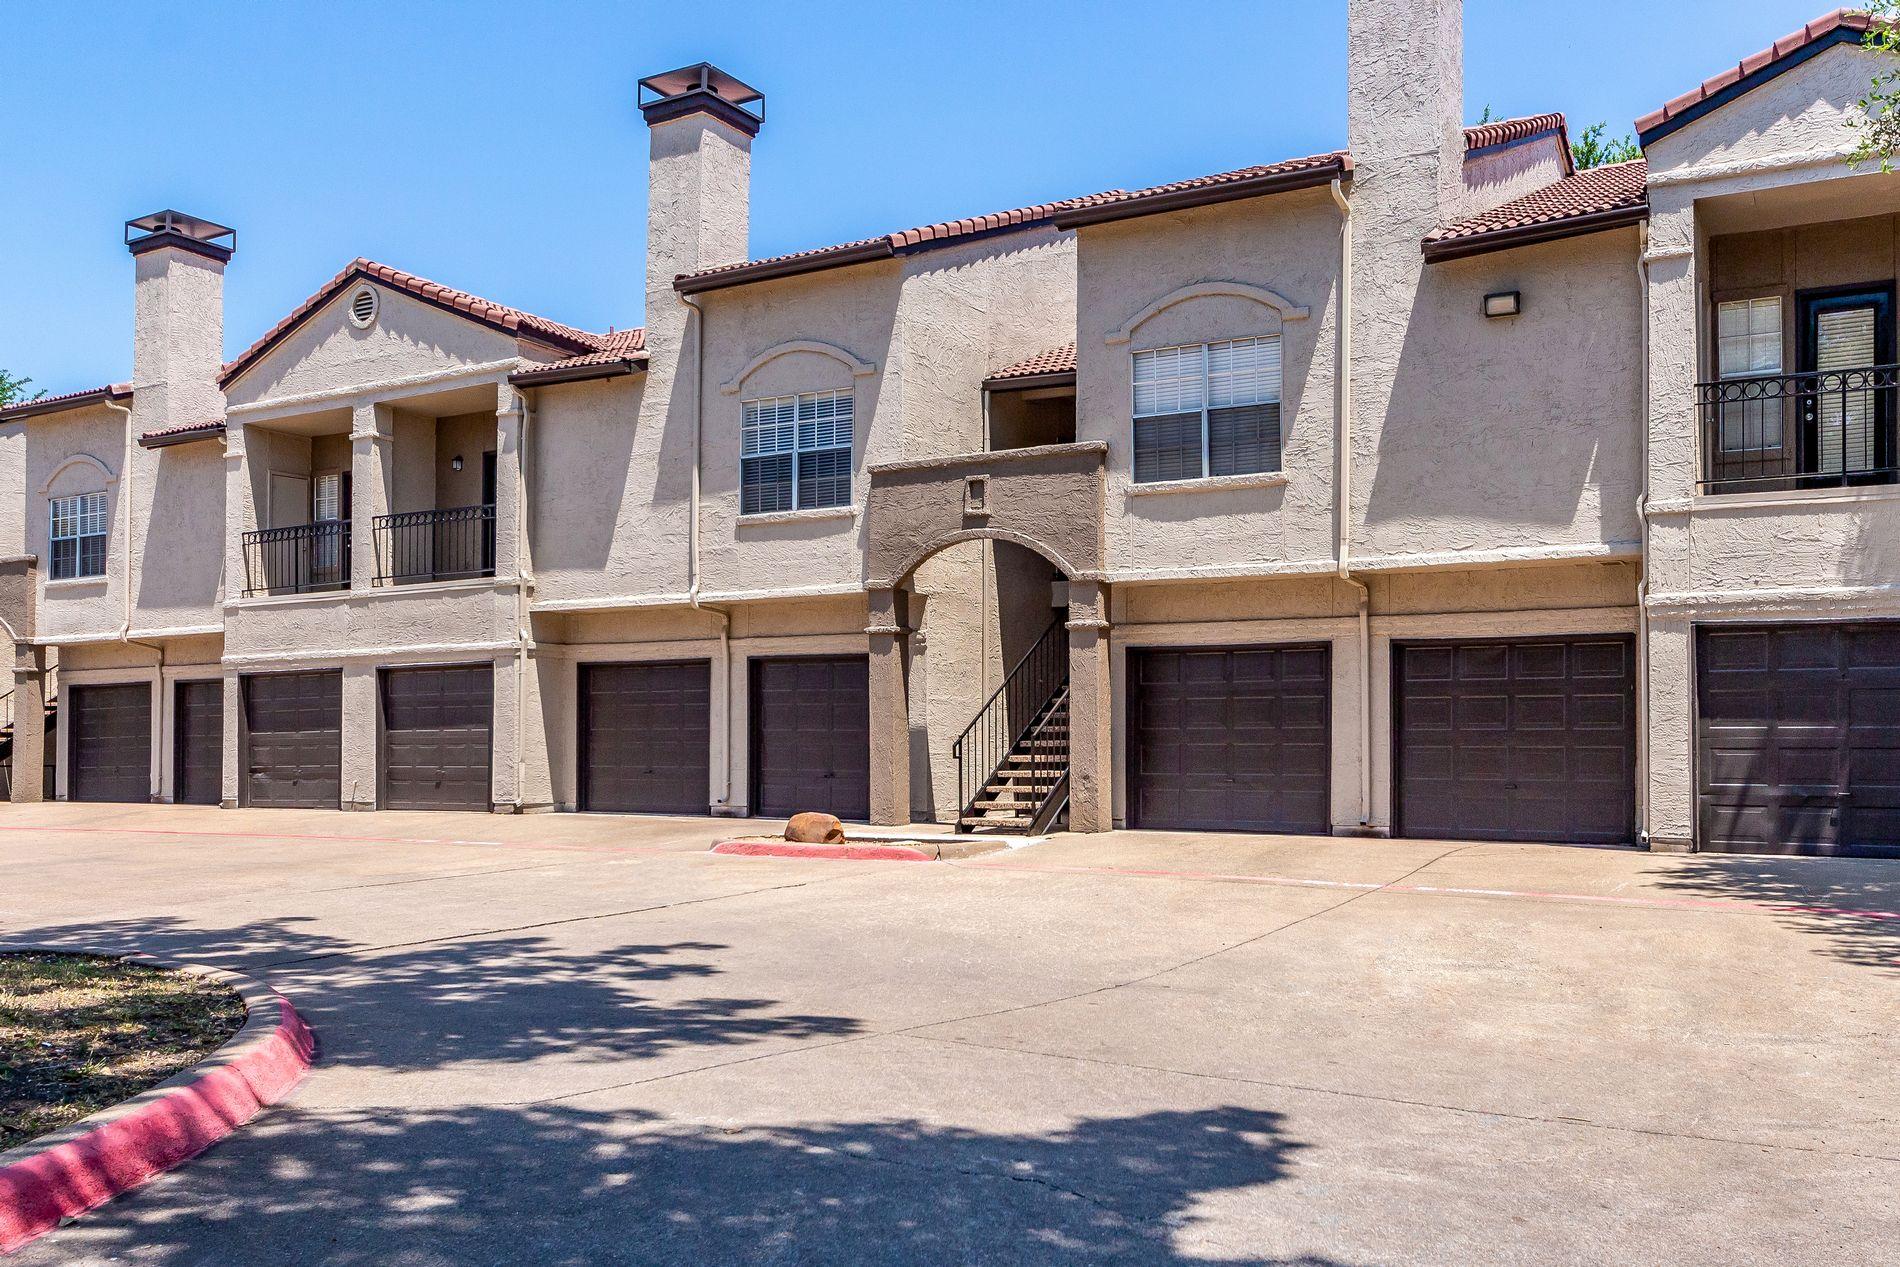 Apartment Building at La Costa Apartments in Plano, Texas, TX